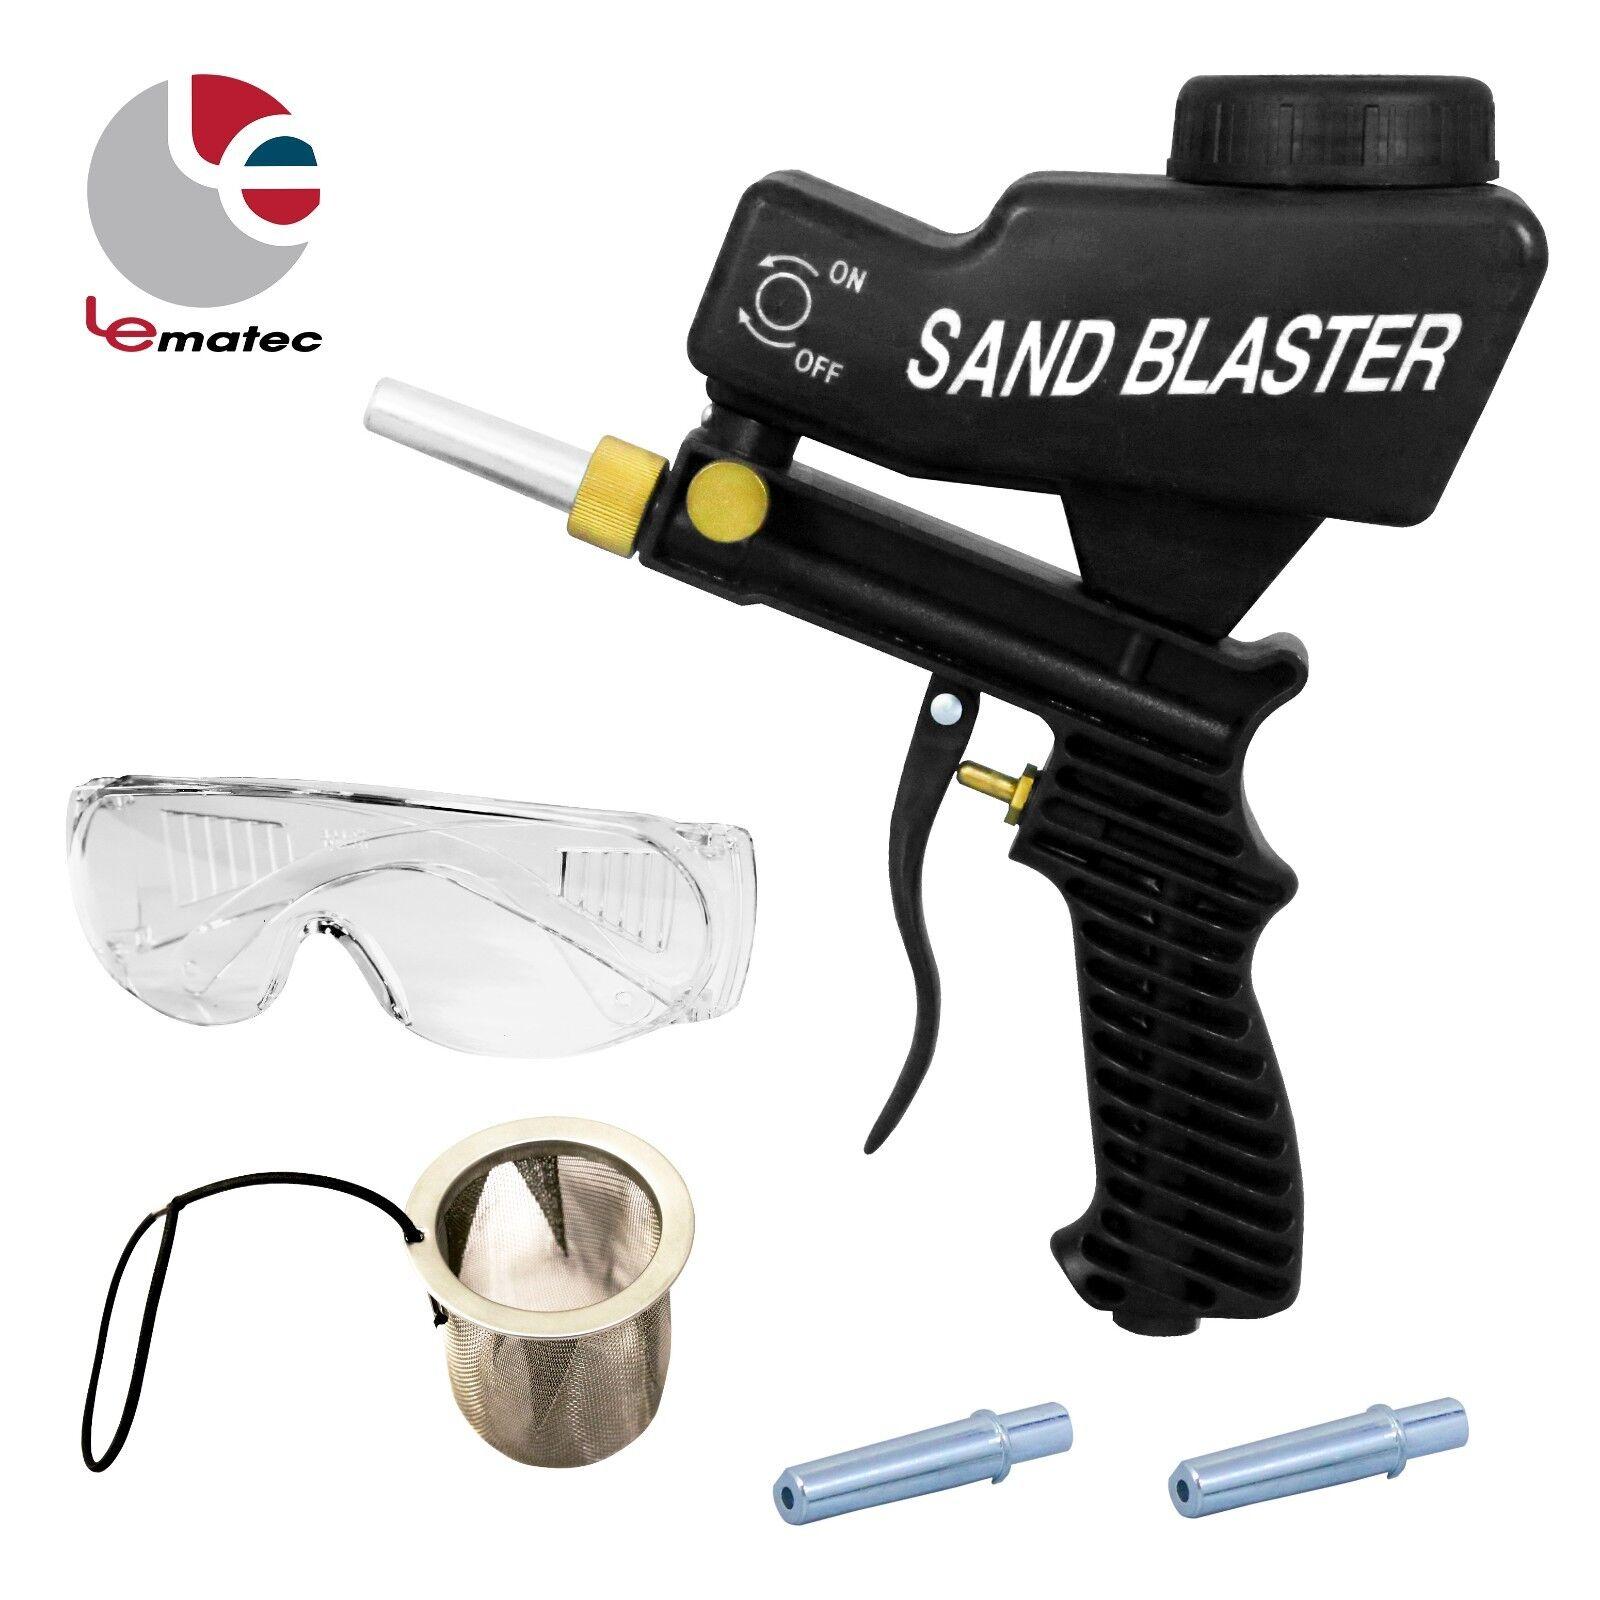 LEMATEC Sandblaster Gun Kits With Safety Glasses and Mesh Accessory Sandblasting